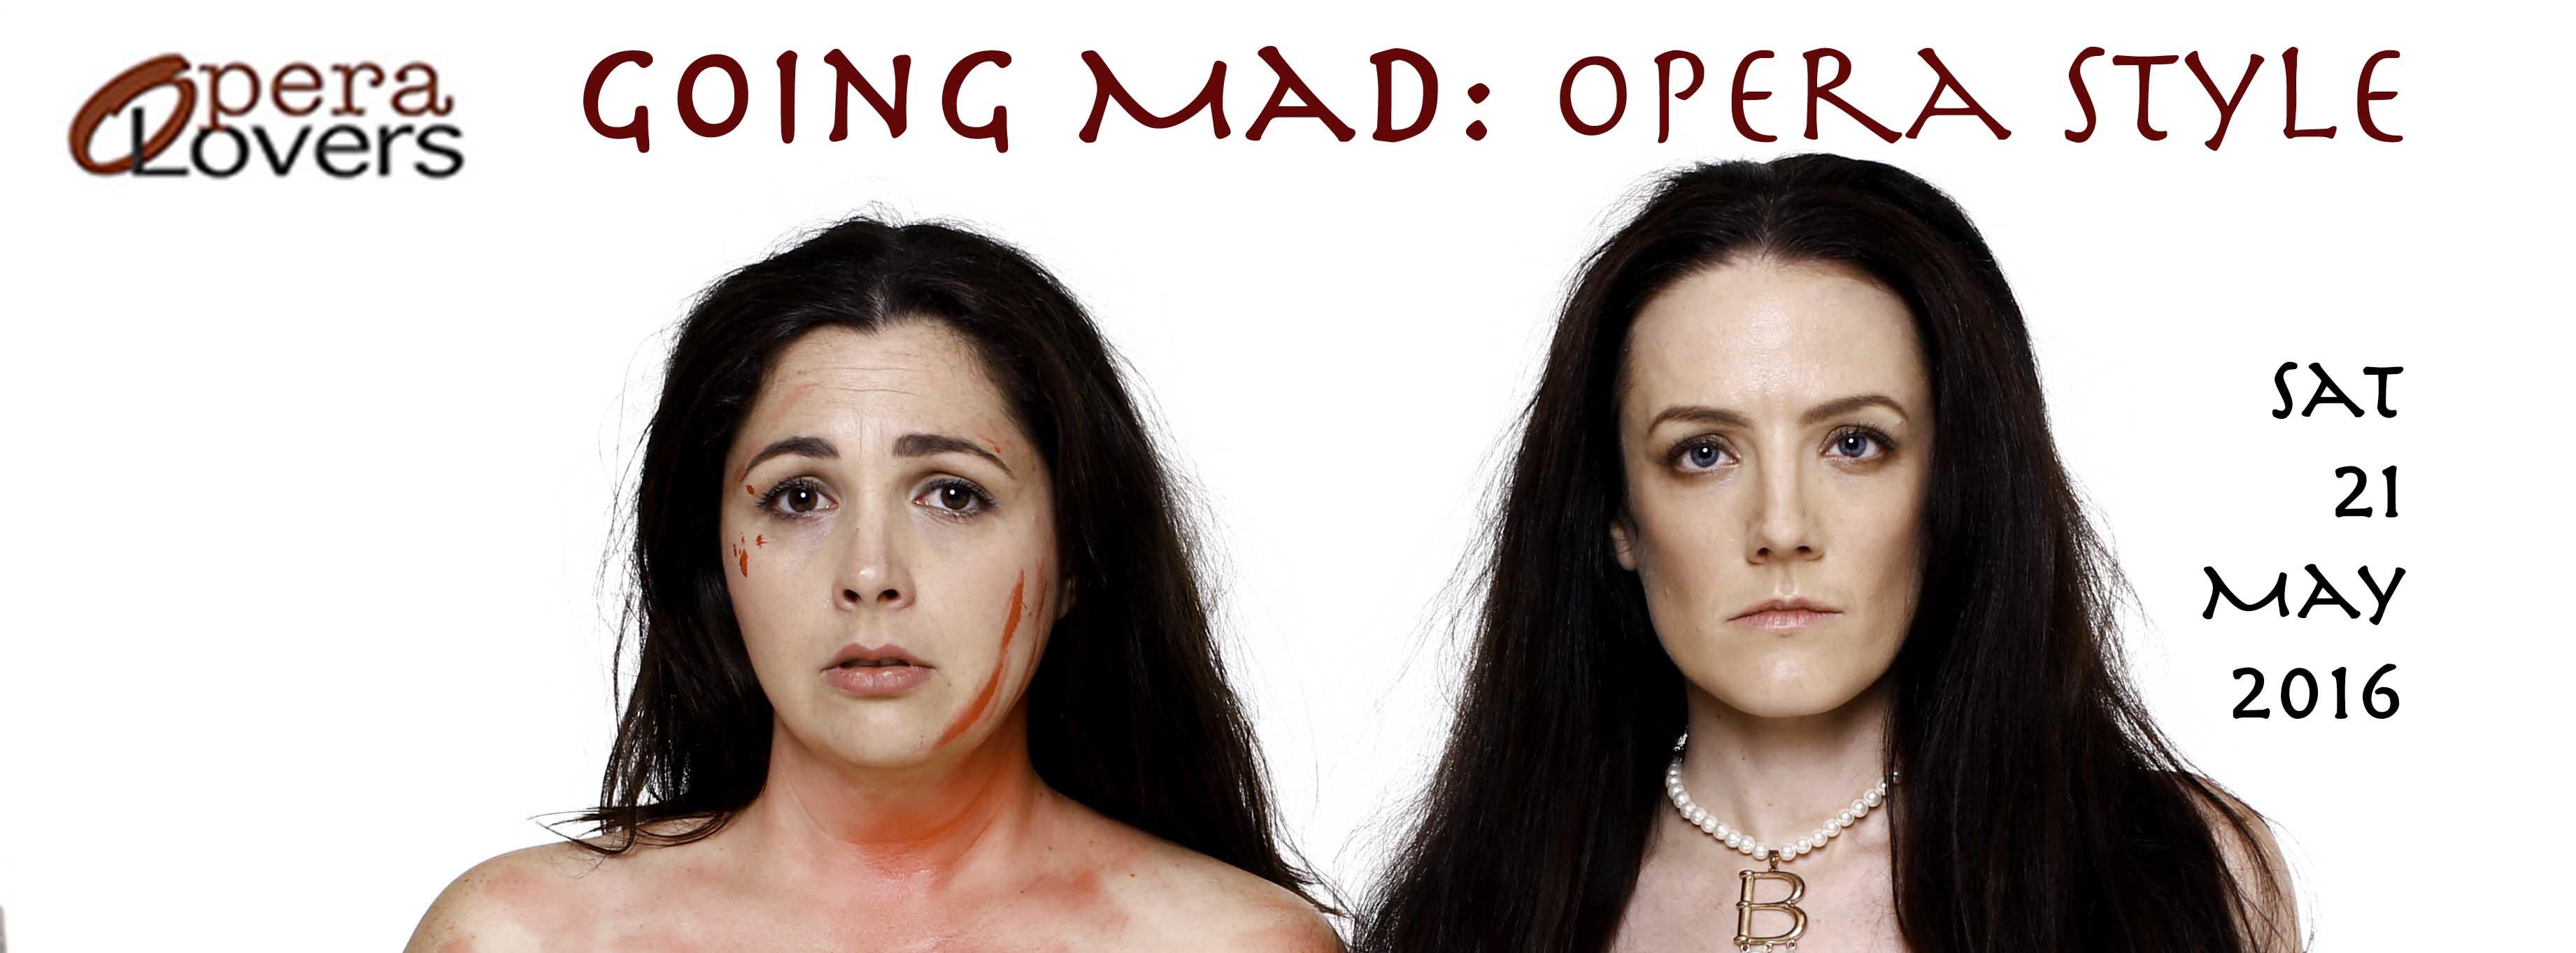 Going Mad: Opera Style Media Image